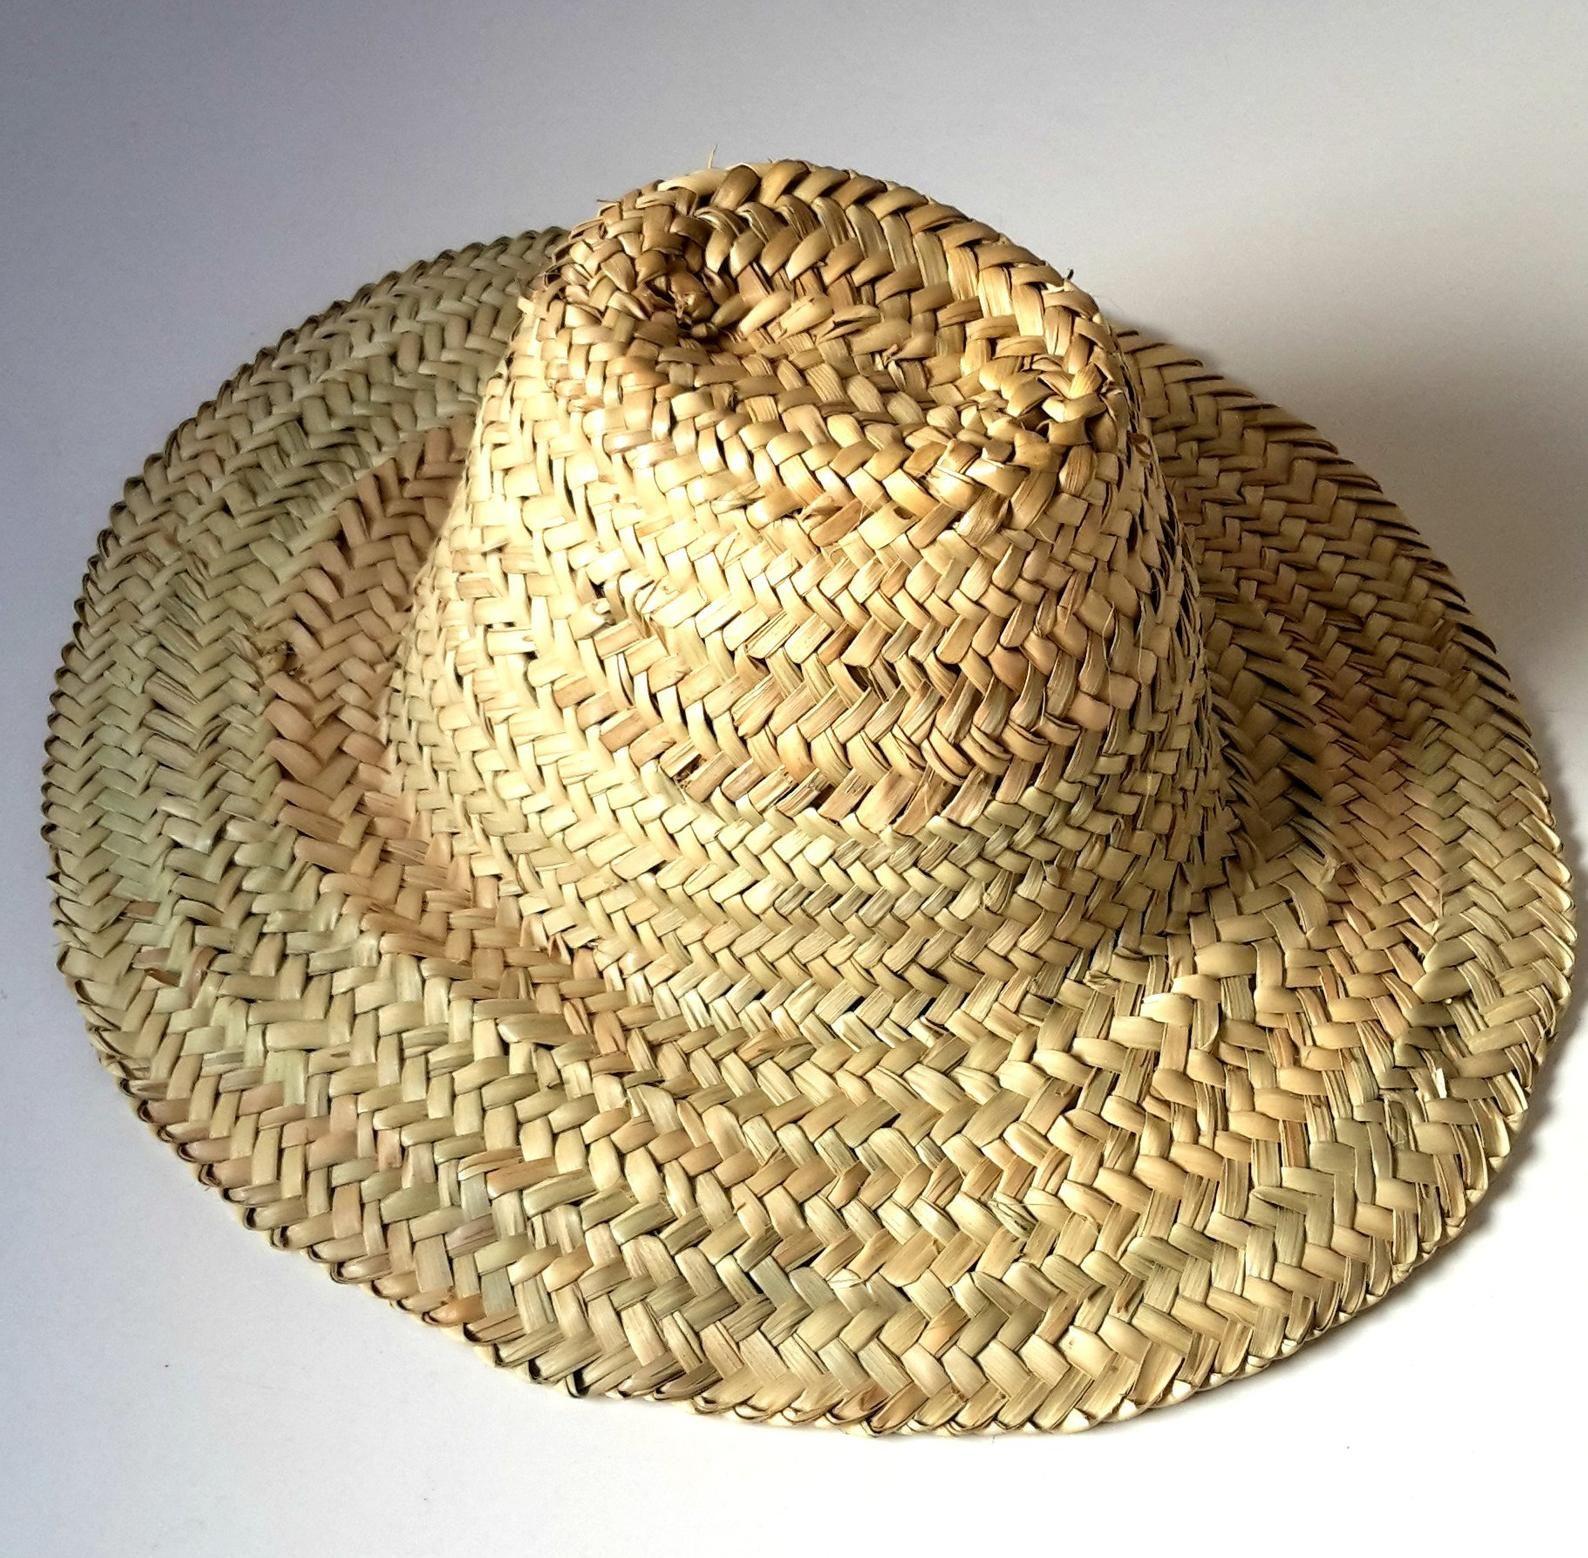 Moroccan Straw Hats Palm Leaf Garden Hat Wicker Etsy Gardening Hat Leaf Hat Hats